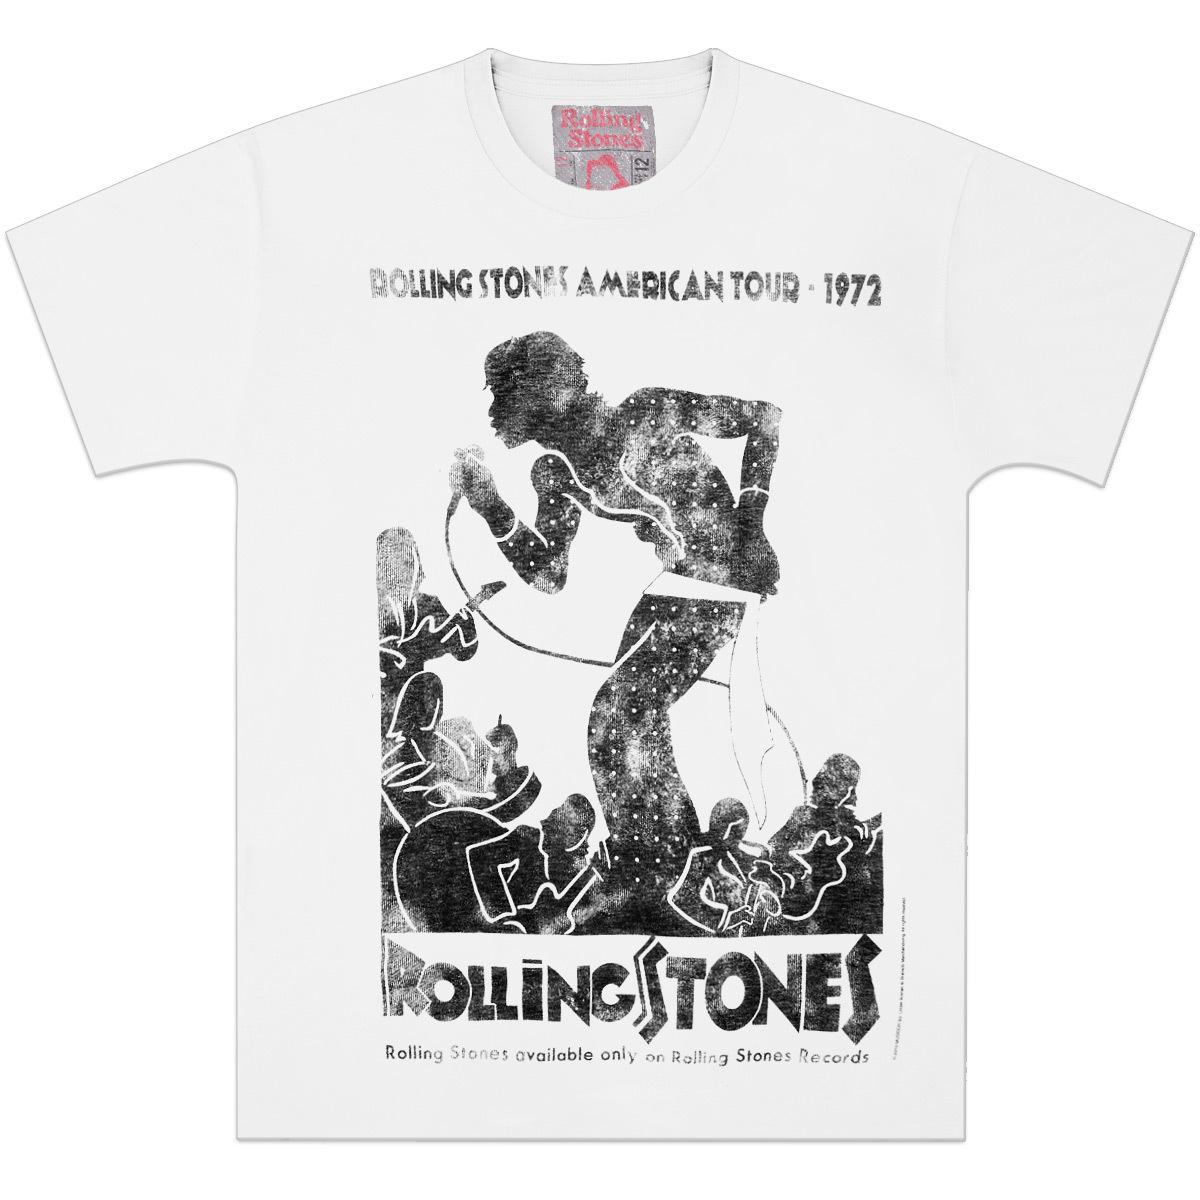 Rolling Stones Vintage Tour Poster T Shirt